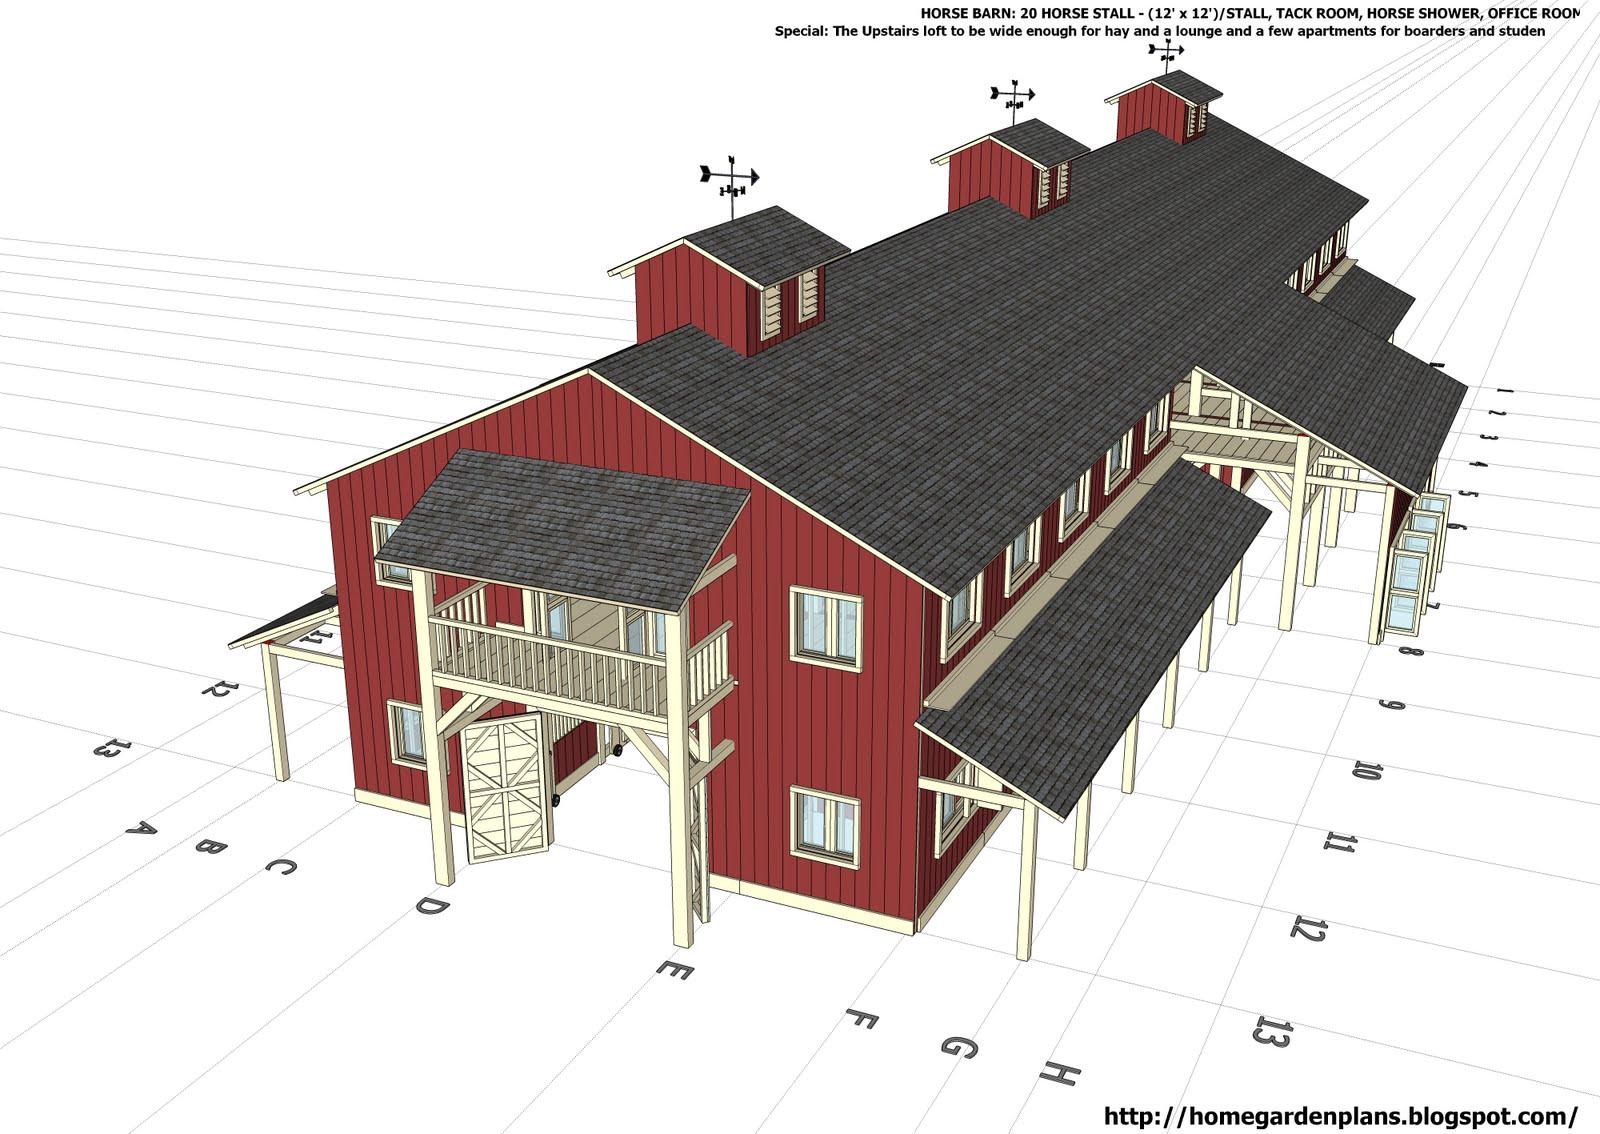 Garage Plans With Loft Apartment] Bedroom Decor Bath With ...